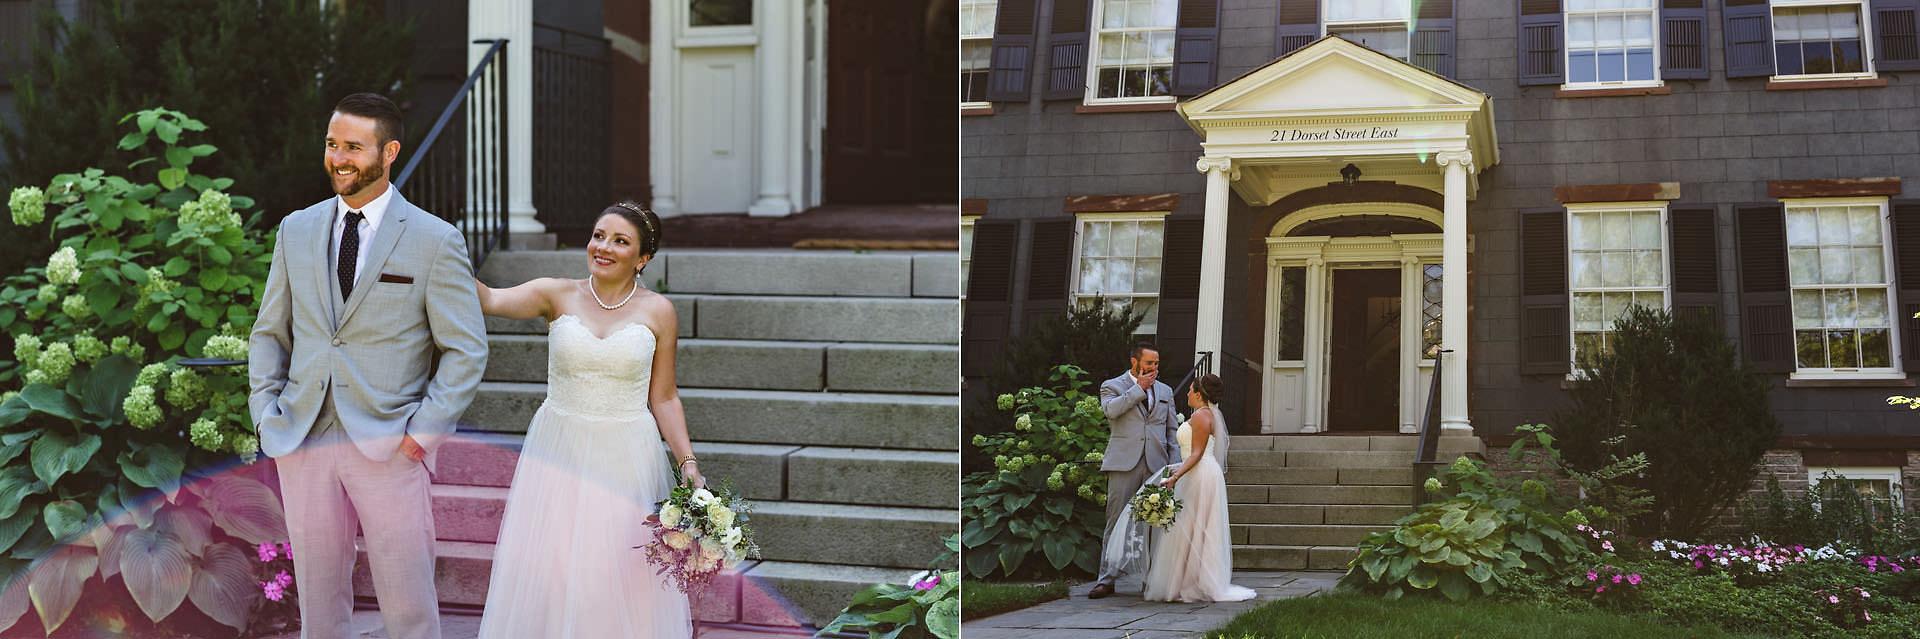 surprised groom at first look